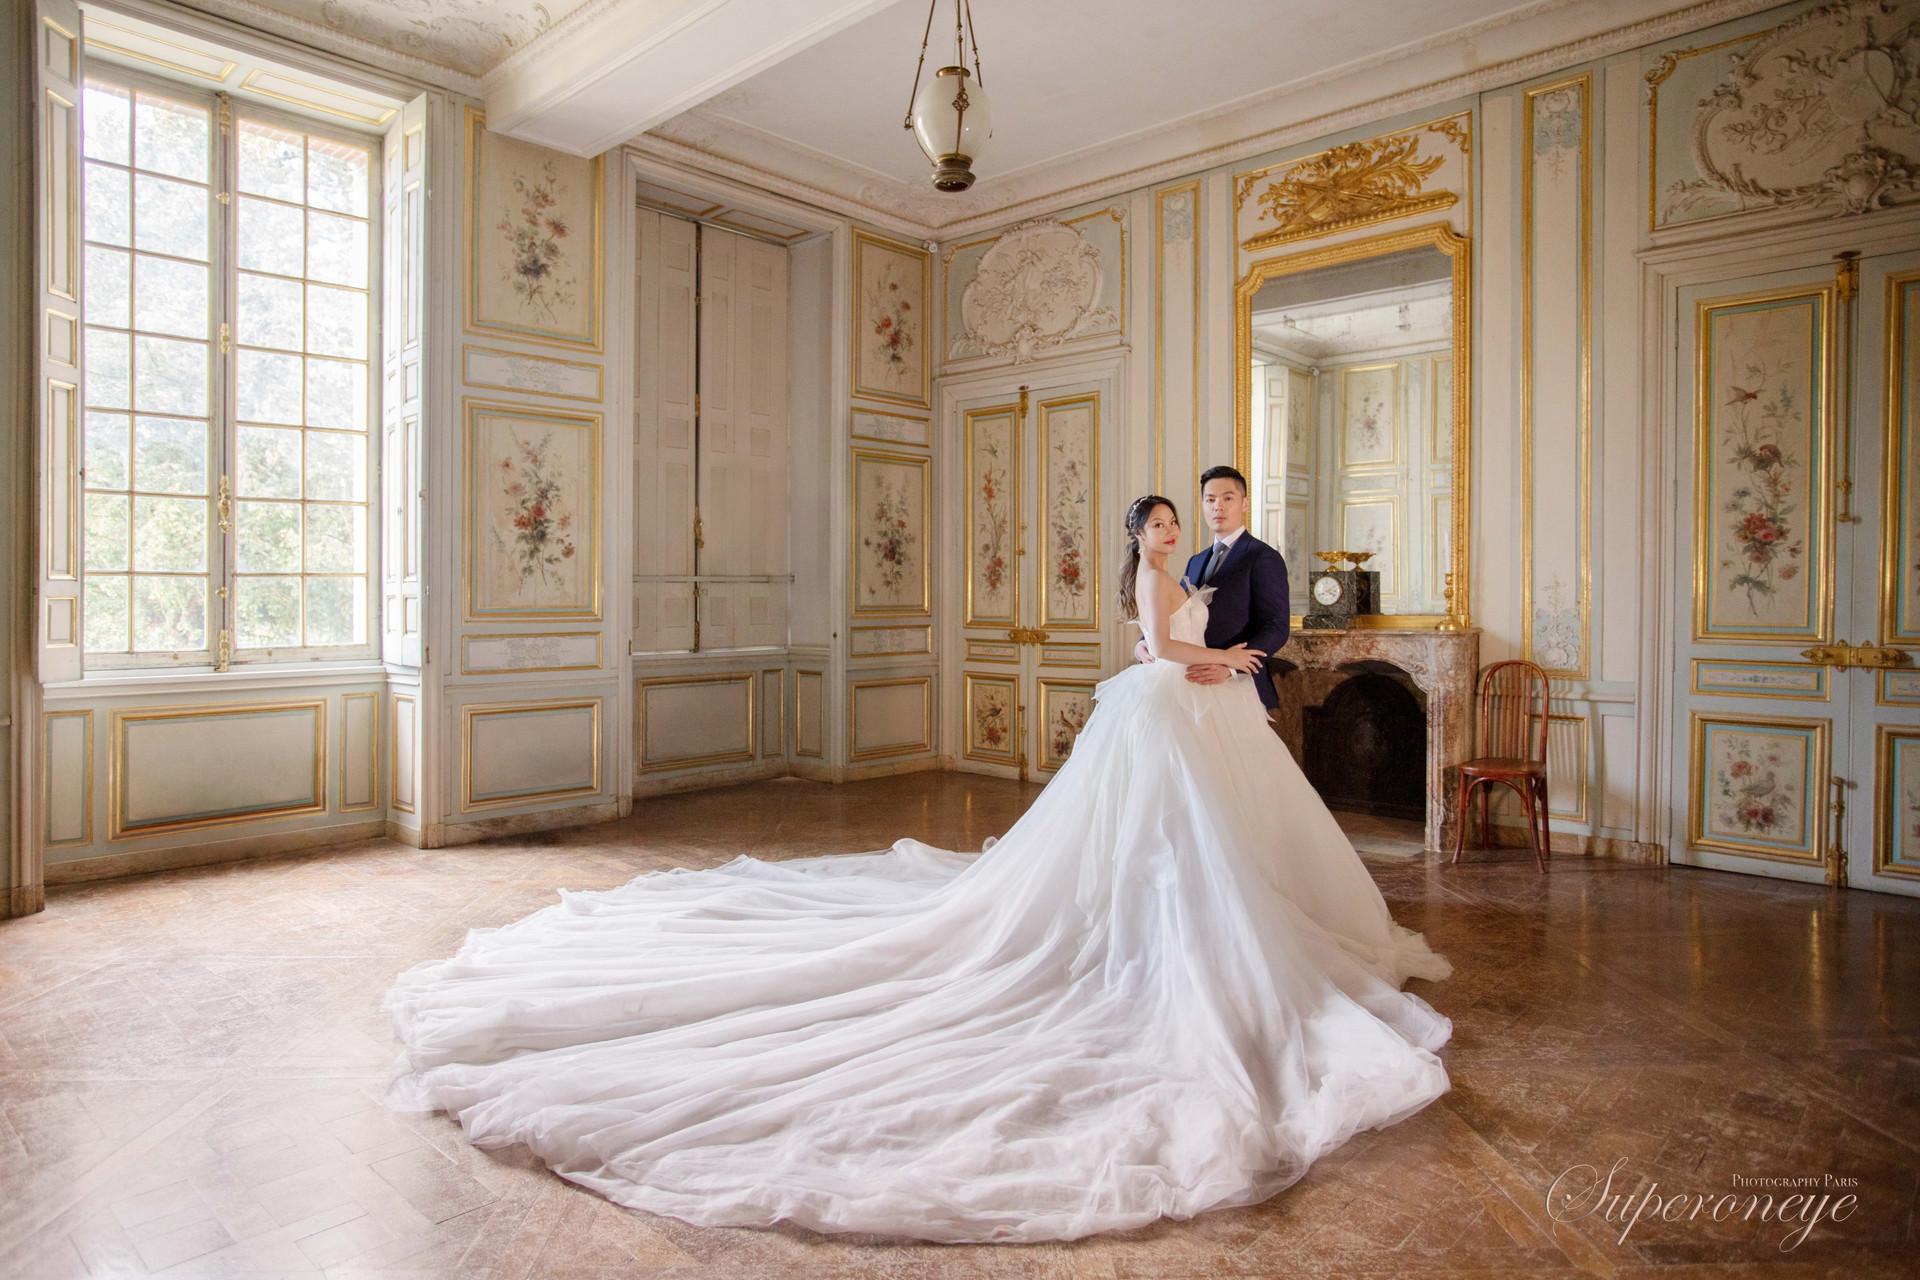 Château de Fontainebleau - Paris prewedding